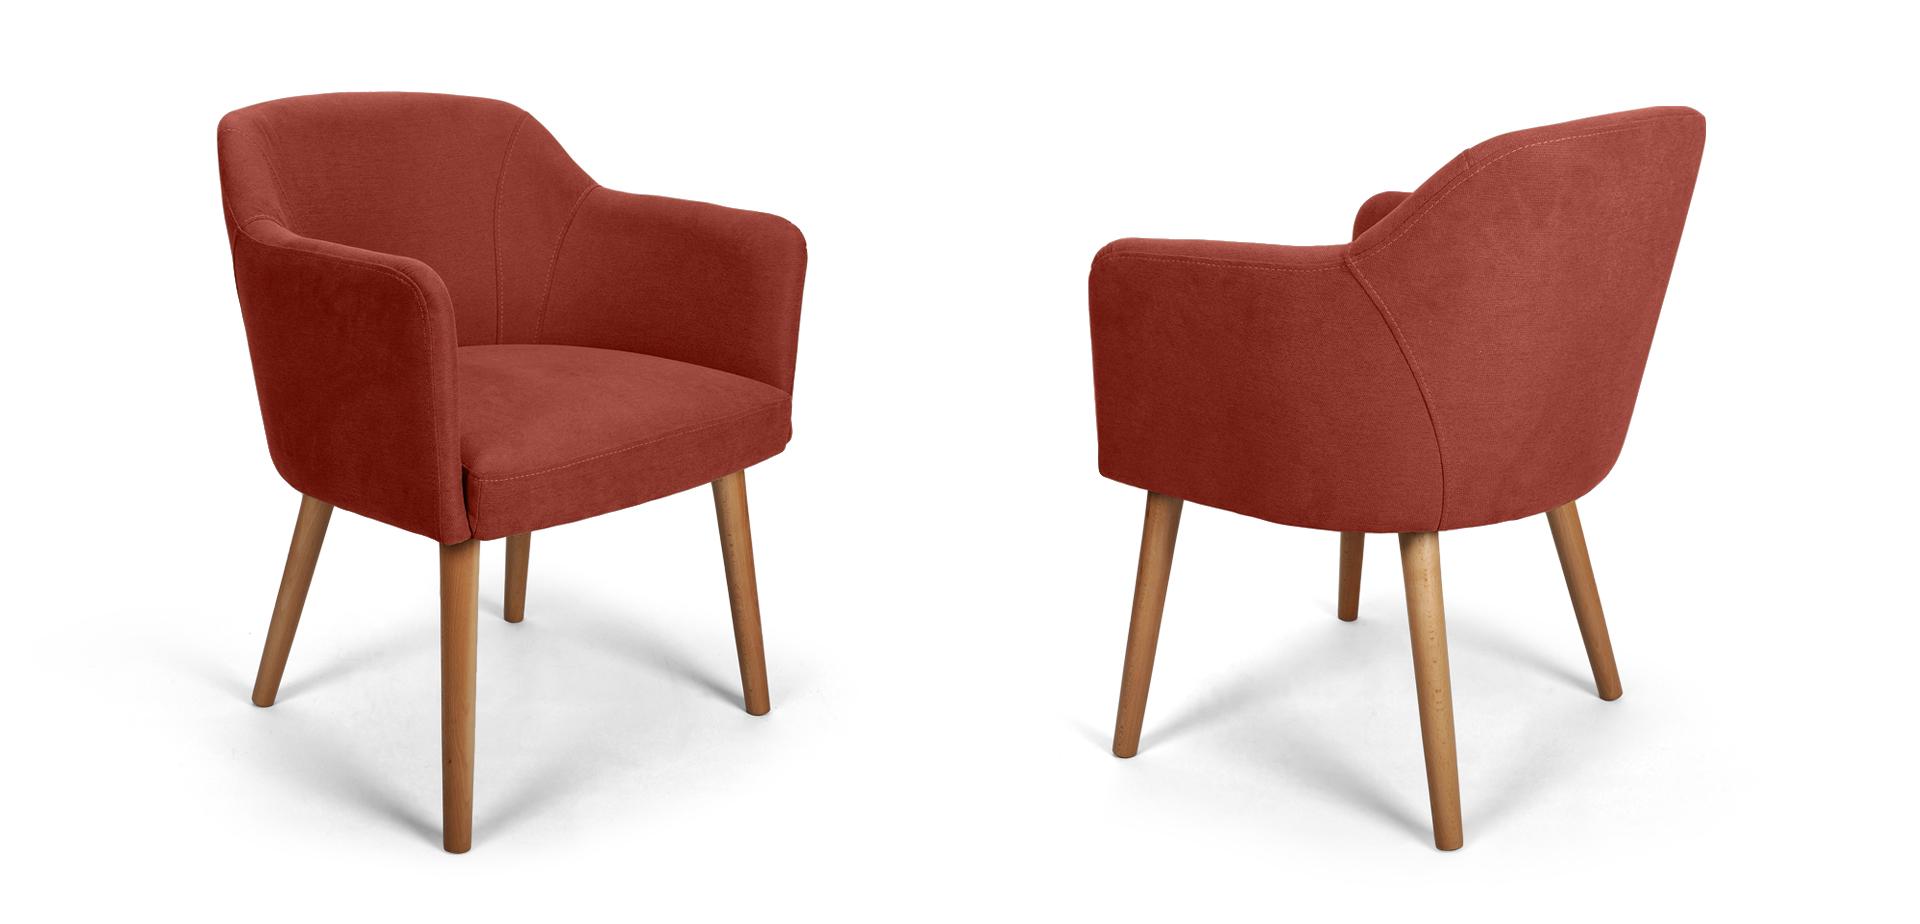 sofia-scaun-05.jpg